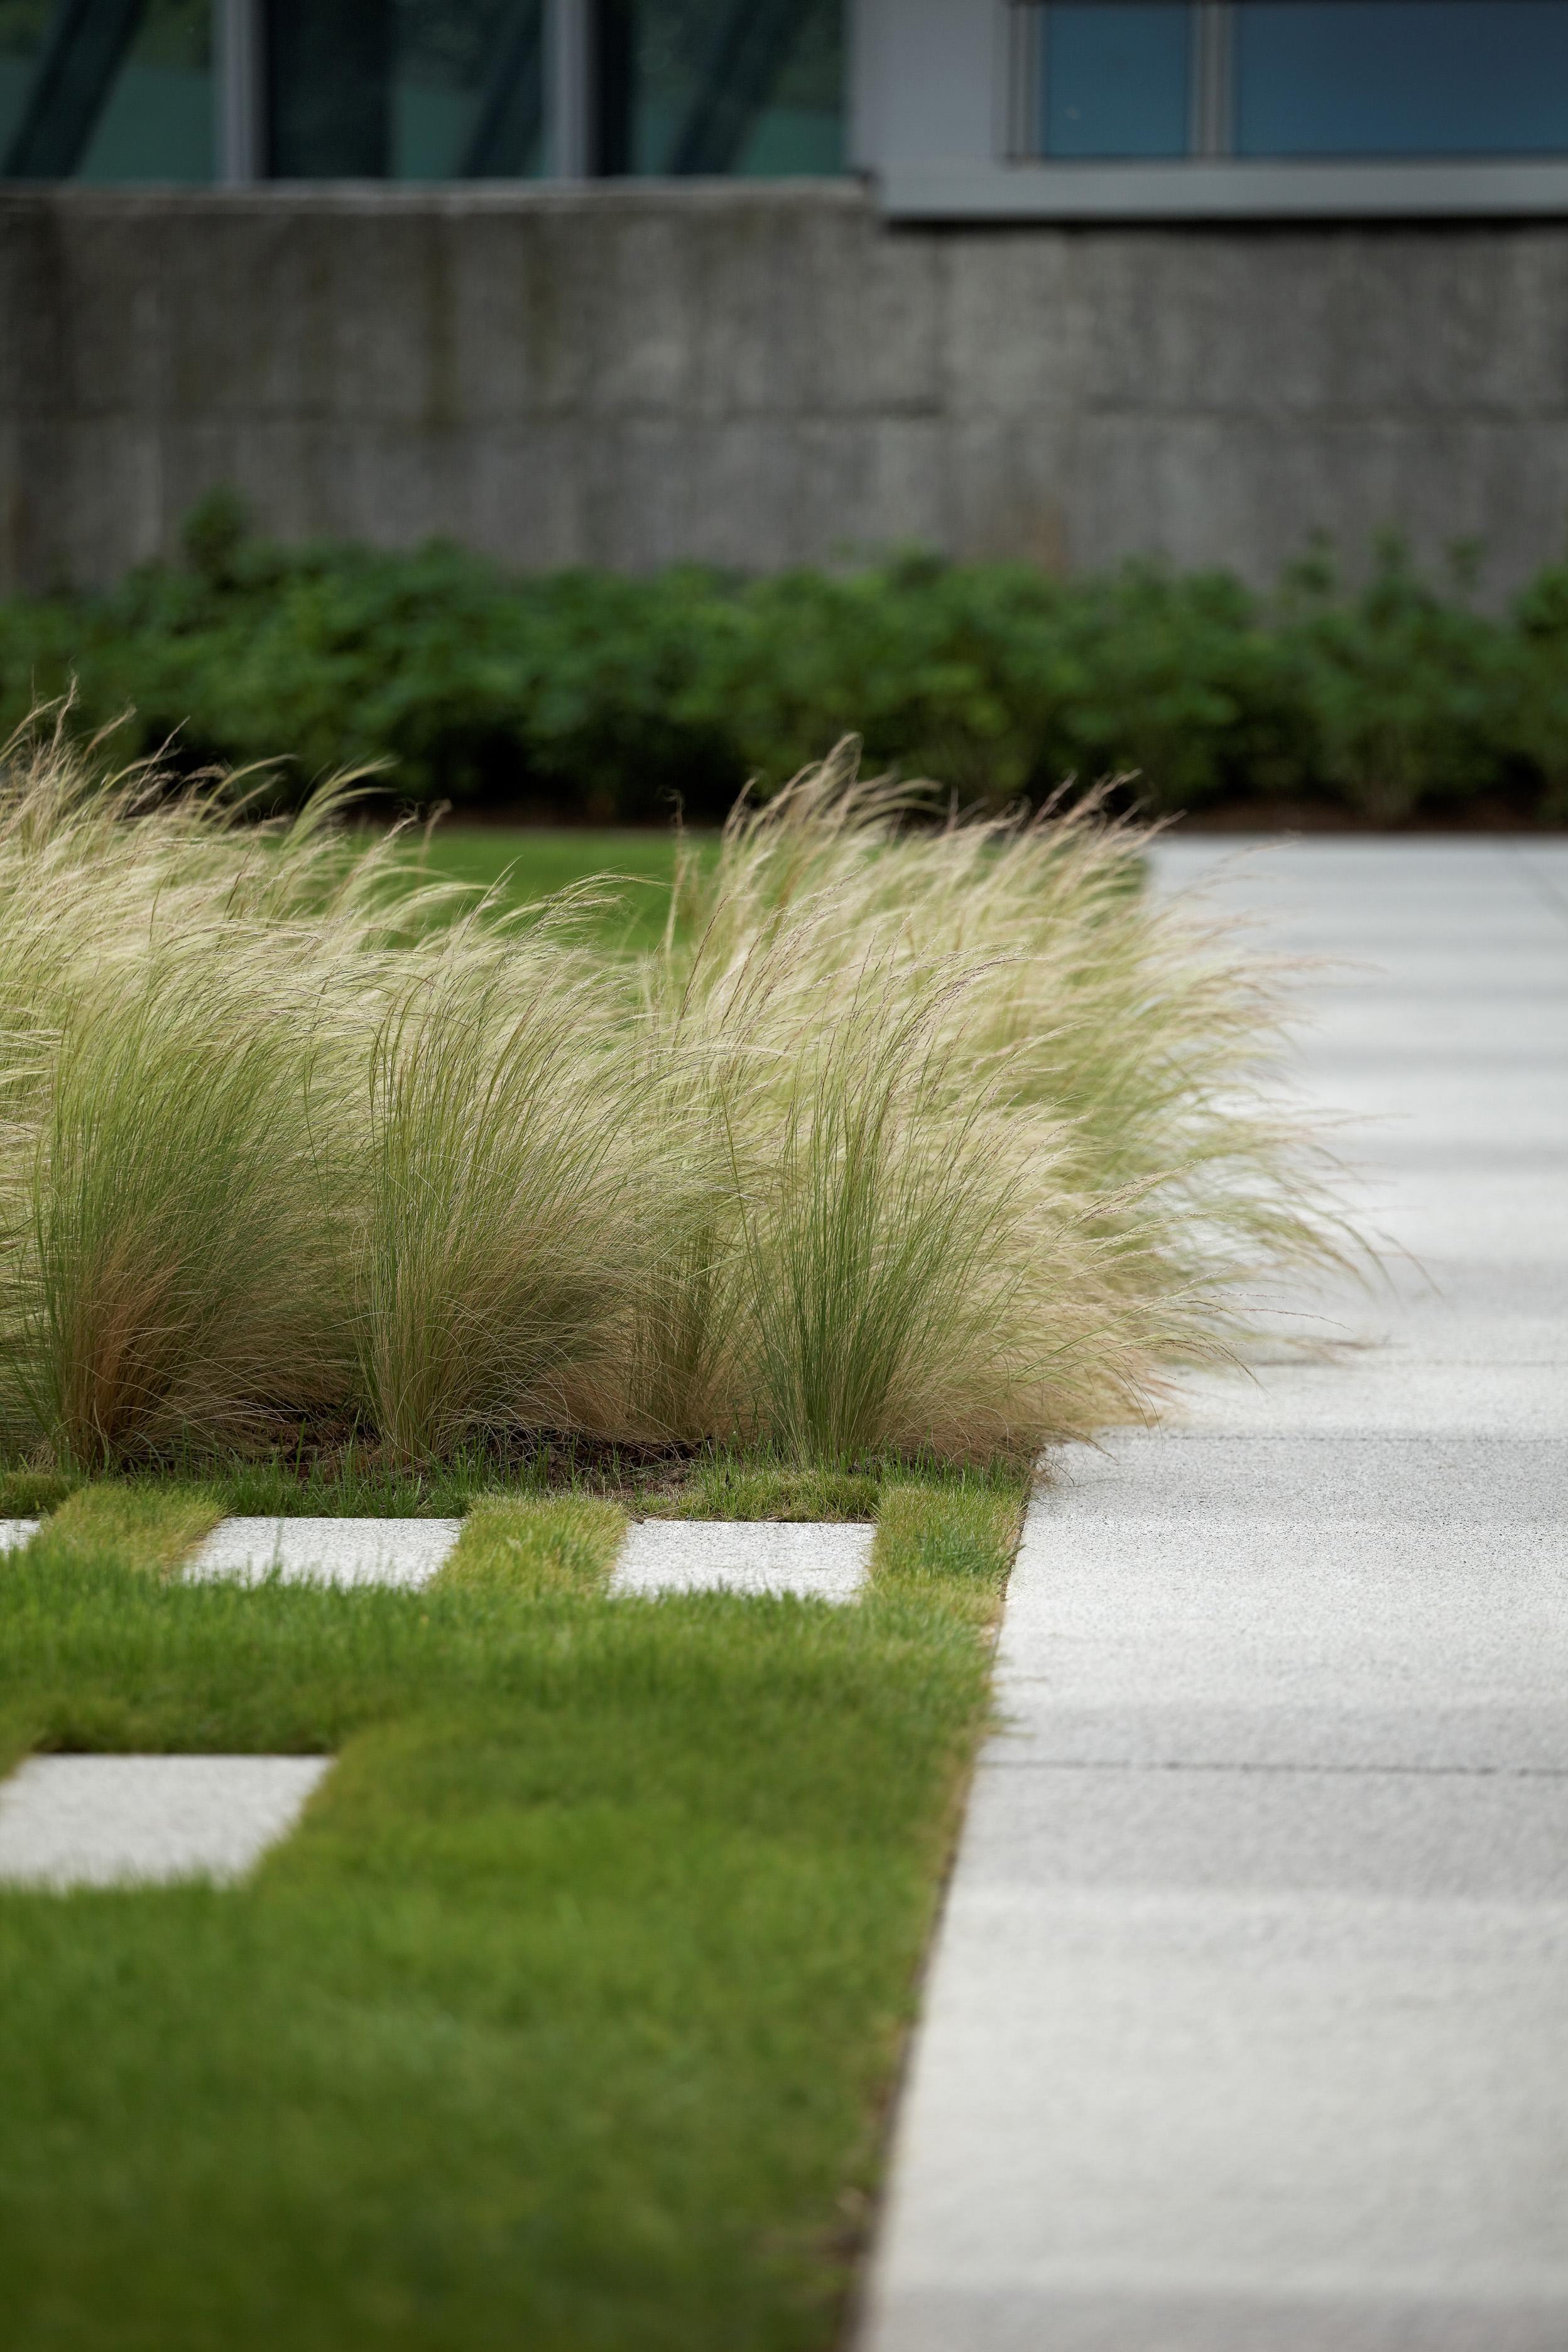 europlaza_tower_paris_la_defense_terraces_gardens_christophe_gautrand_landscape_outdoor_designer_4.jpg